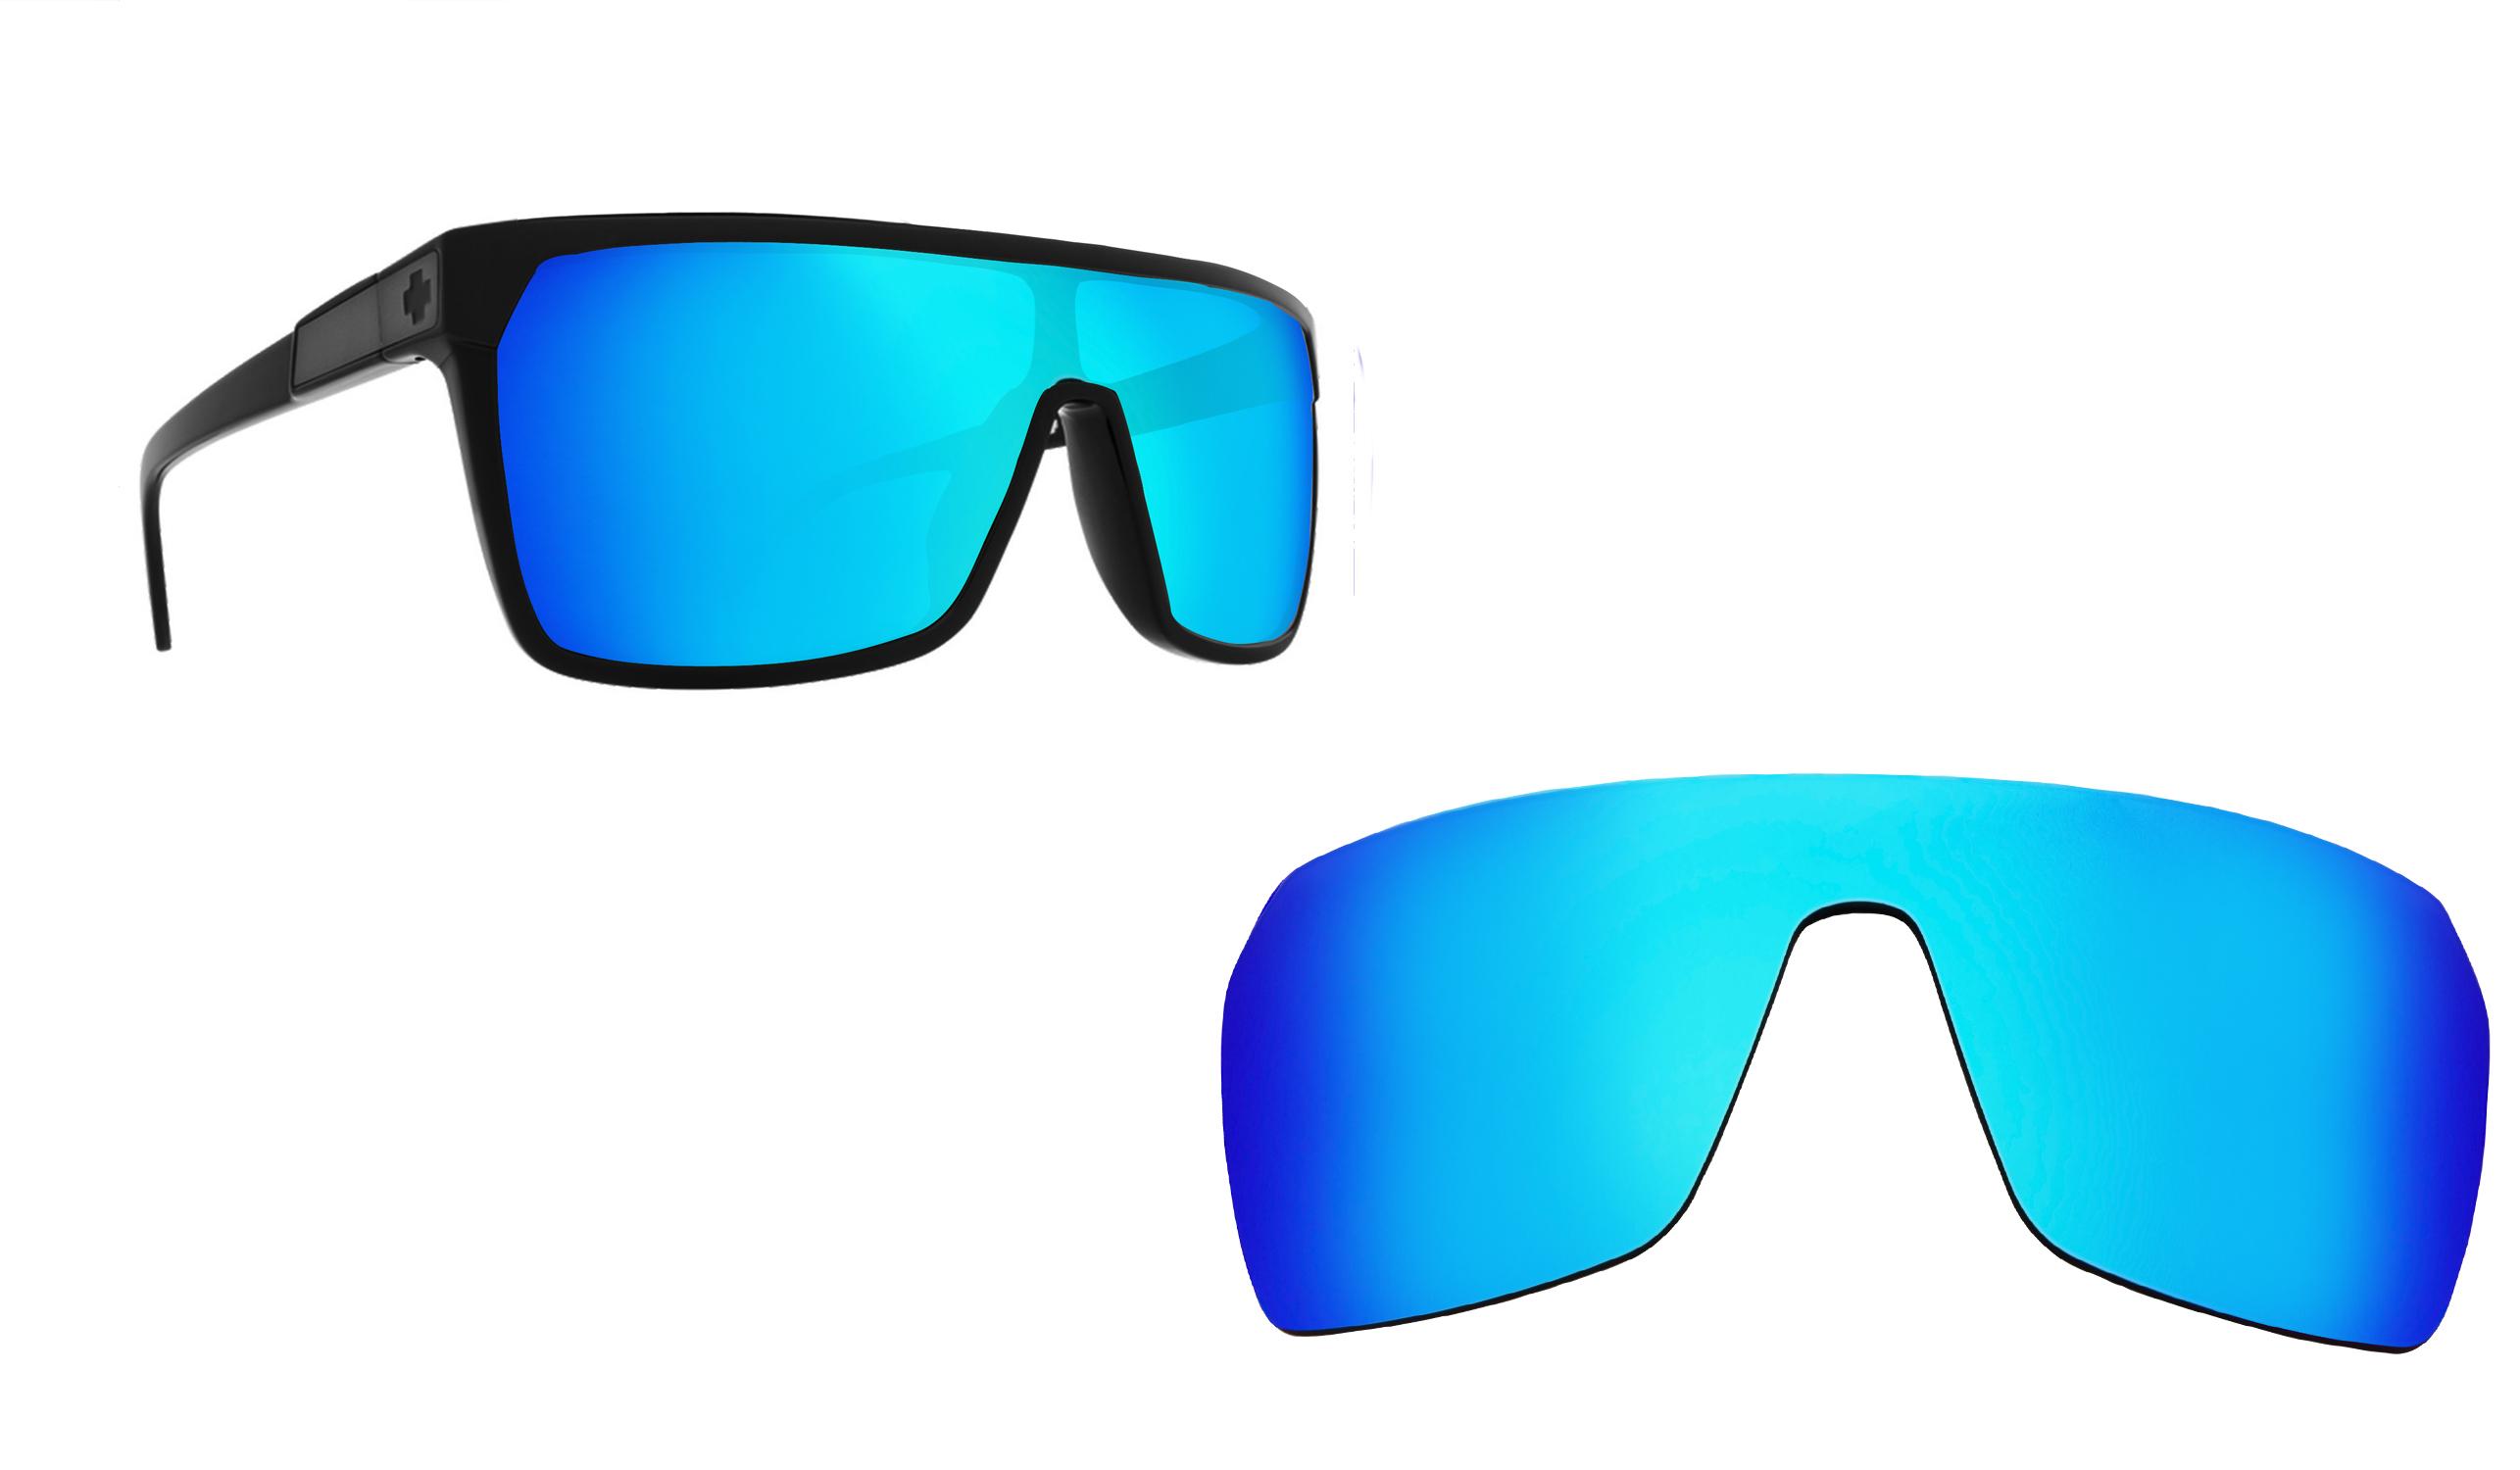 ccfc4f7fa65 Flynn Replacement Lenses by SEEK OPTICS to fit SPY OPTICS Sunglasses ...